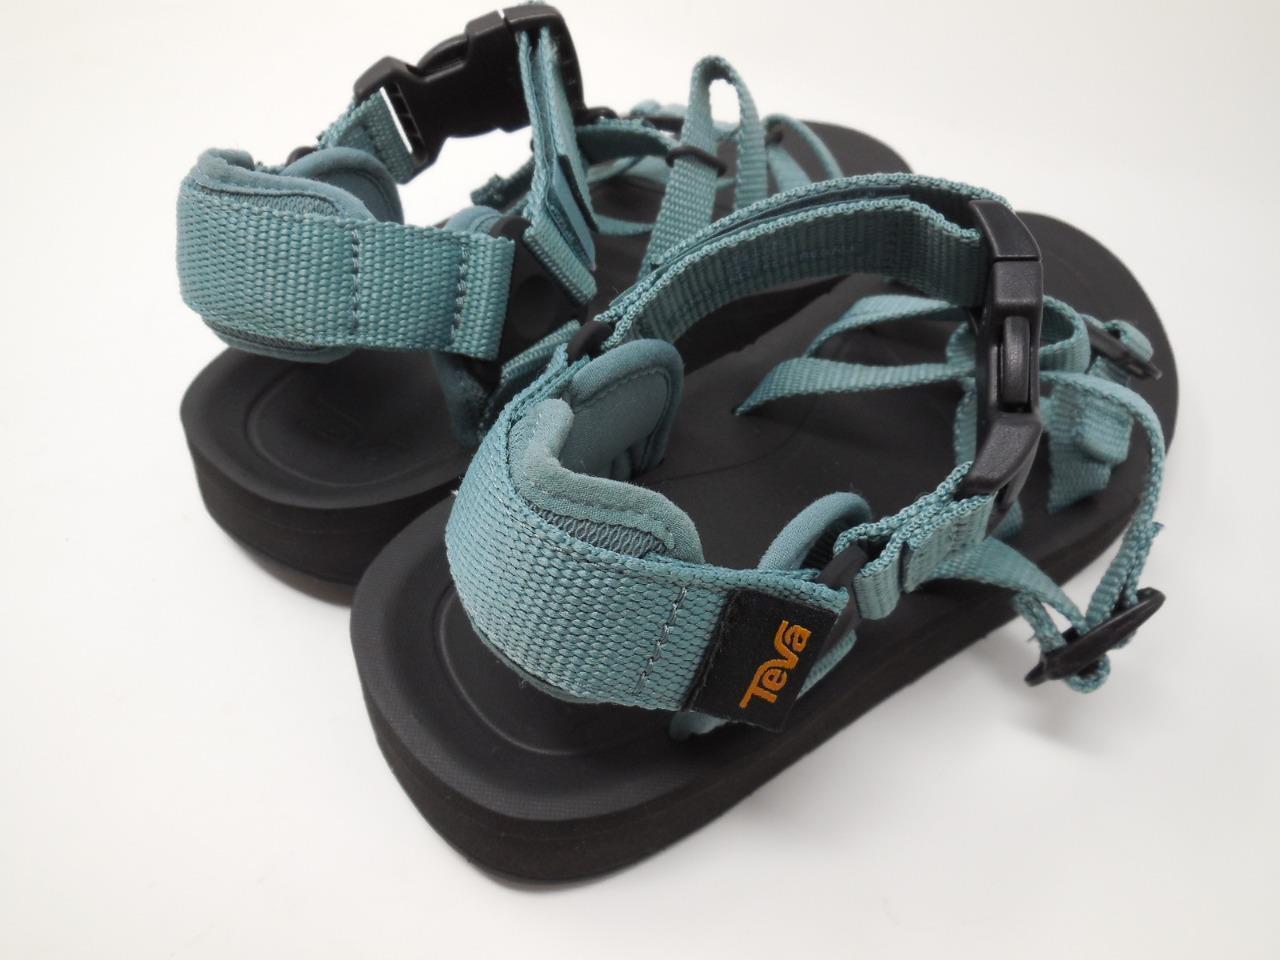 48ec9db5dd06 NEW TEVA Alp Premier Hiking Sandals Teal Webbing Casual Men s US 9M SHIPS  TODAY